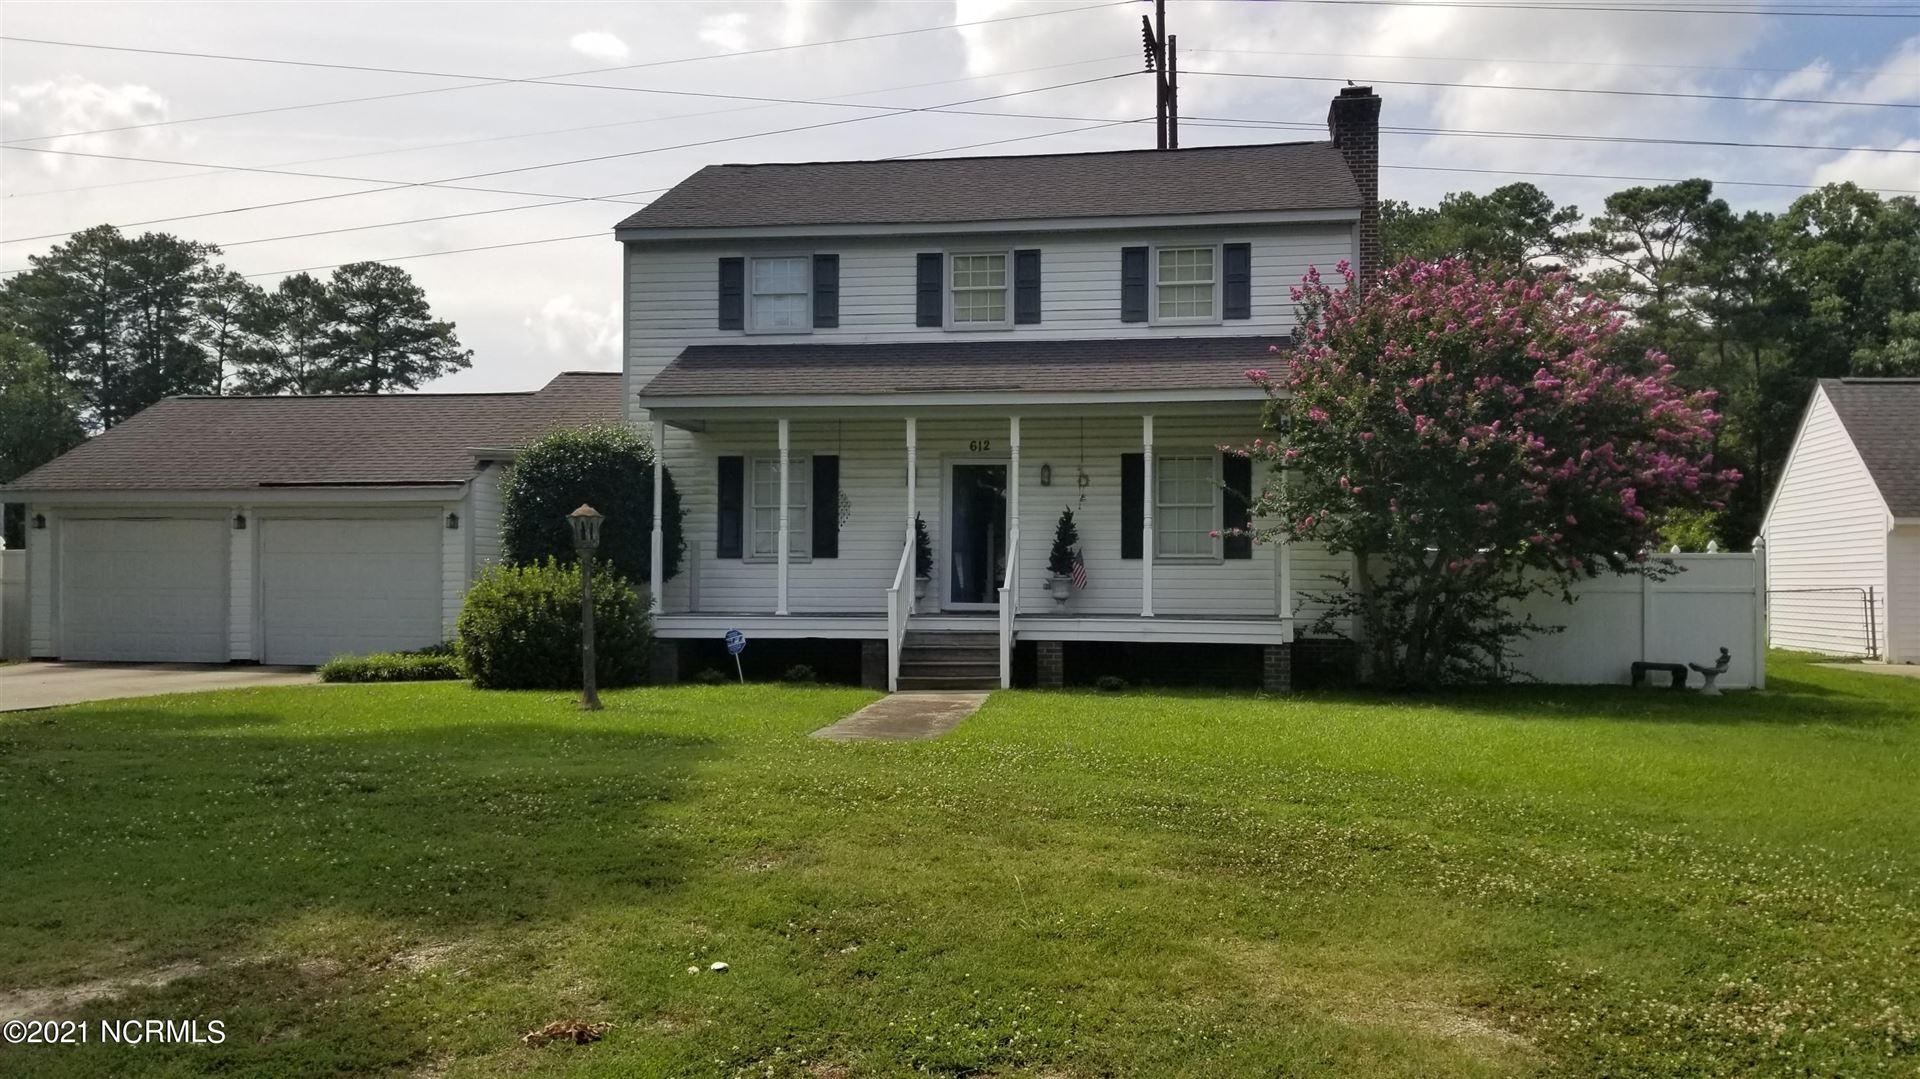 Photo of 612 Dana Lane, Rocky Mount, NC 27803 (MLS # 100288225)